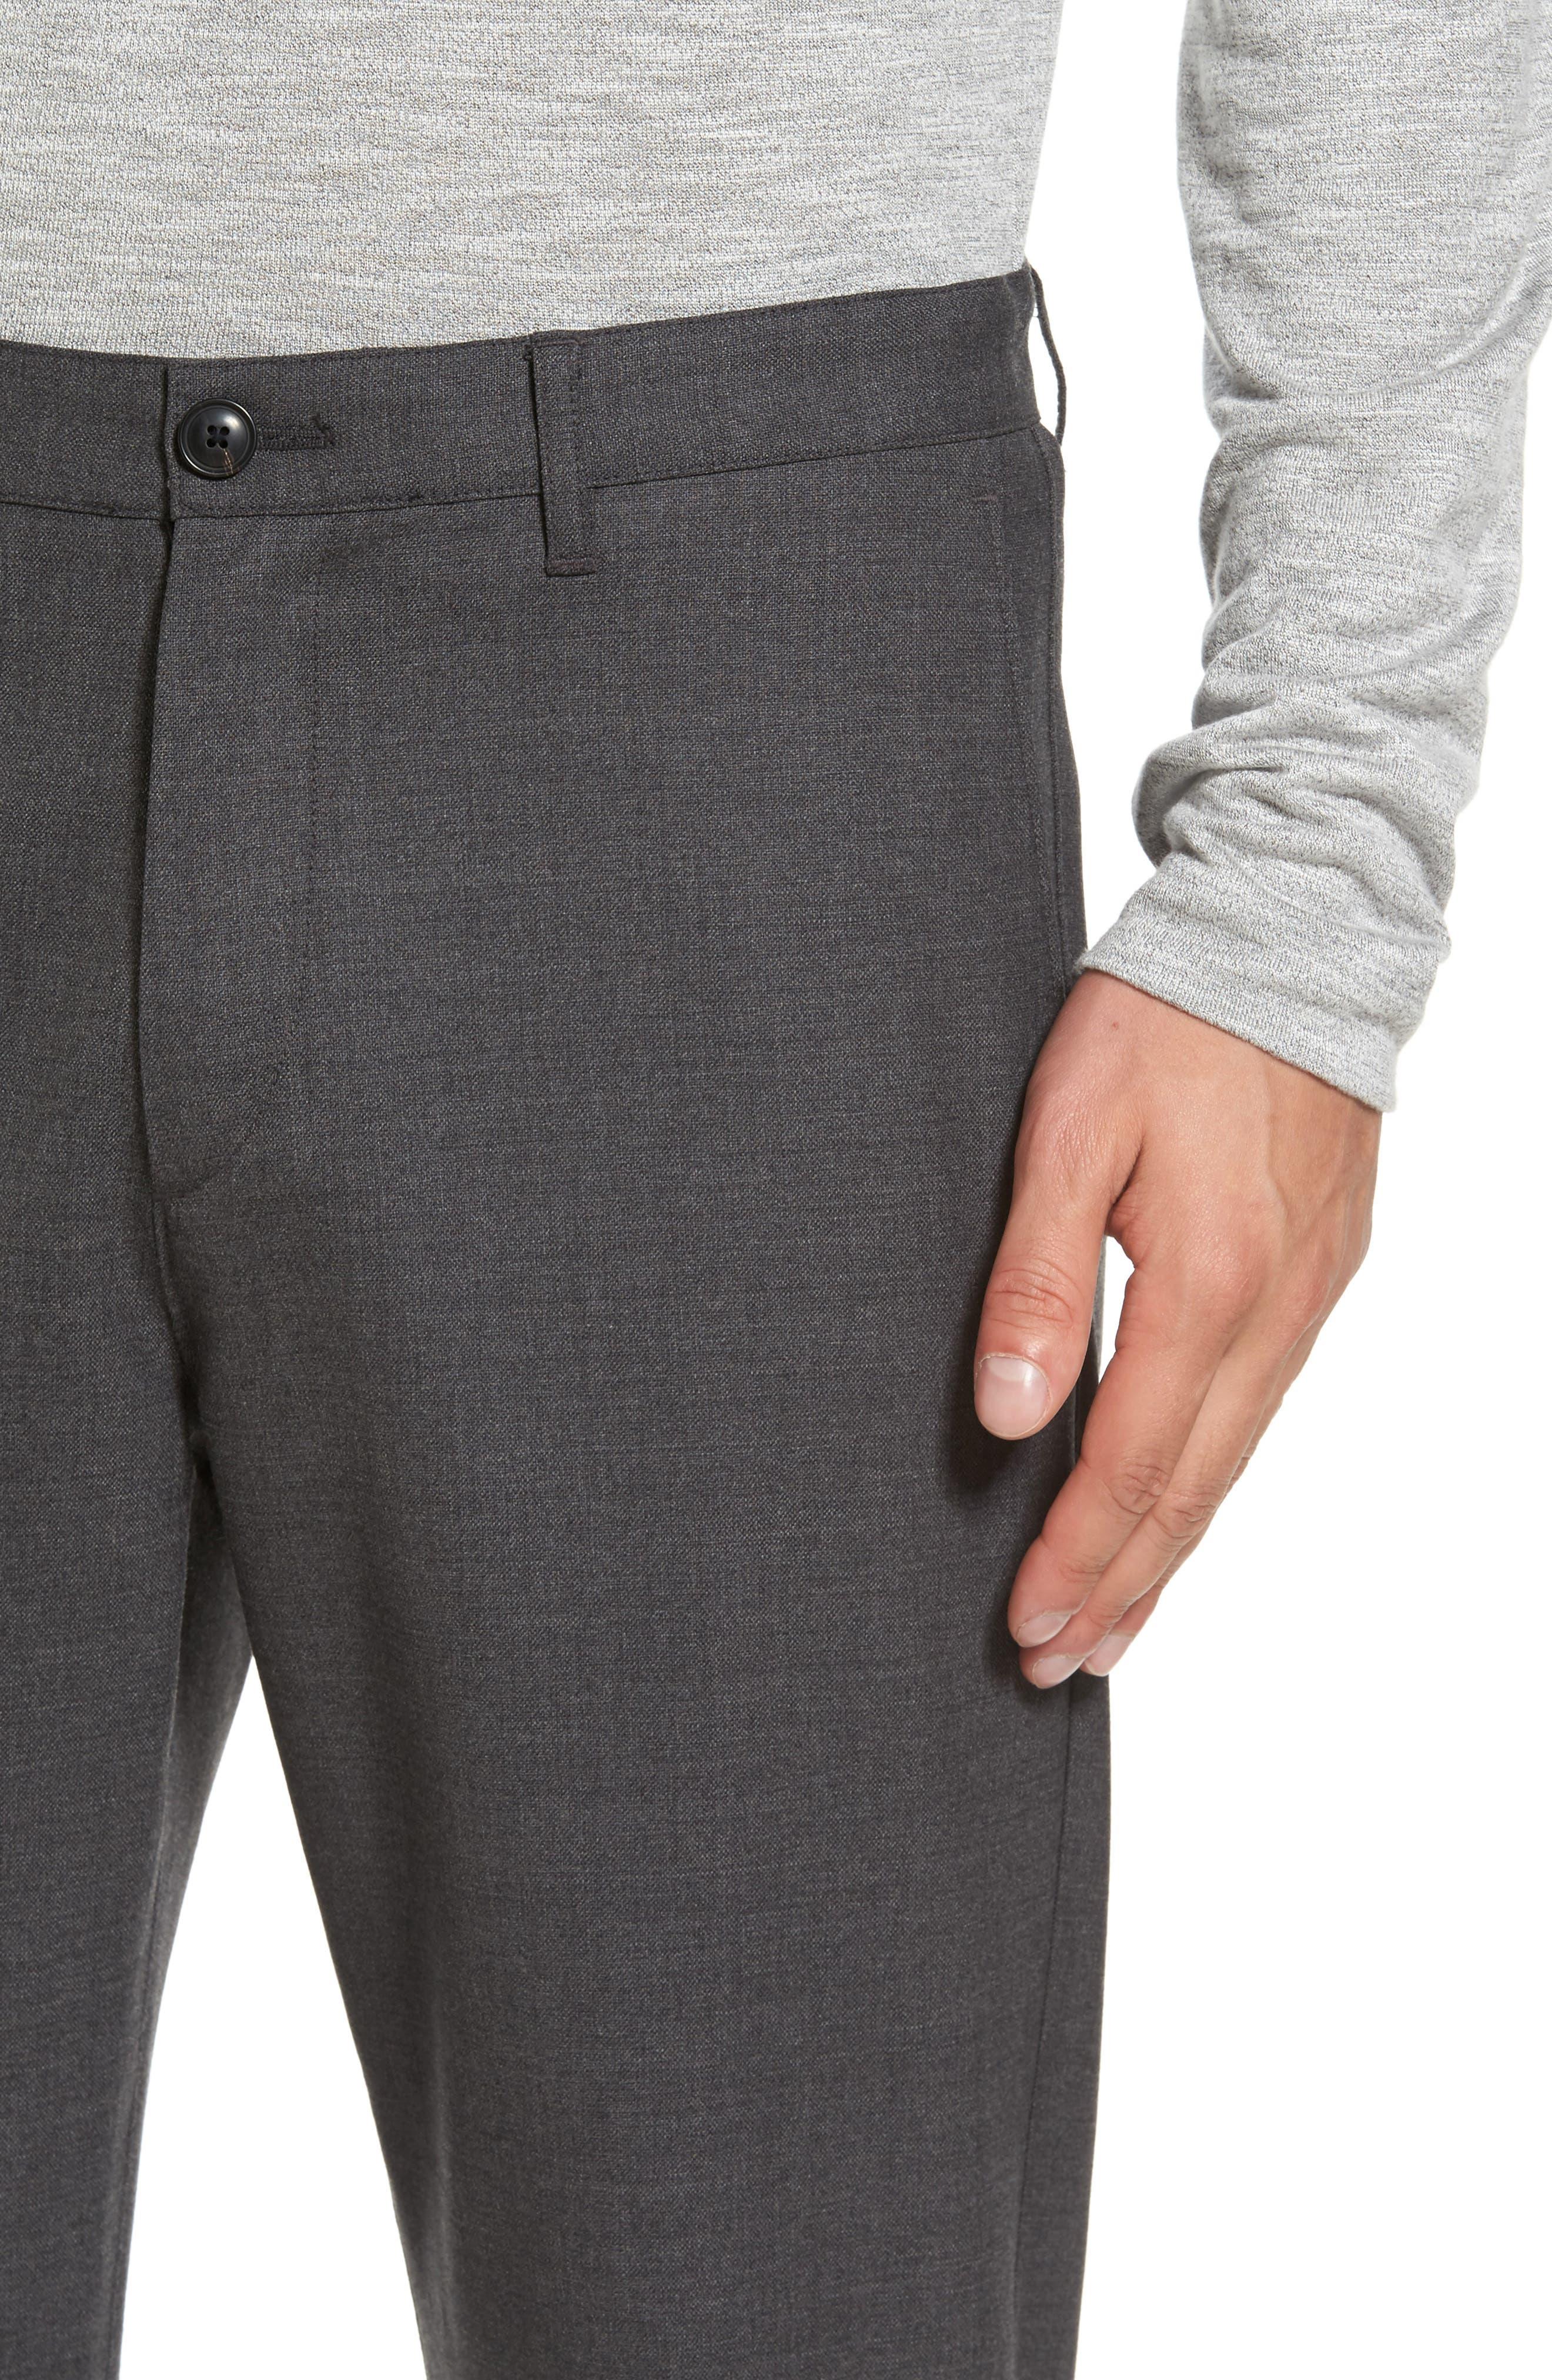 Zaine Gearheart Slim Straight Pants,                             Alternate thumbnail 4, color,                             Medium Charcoal